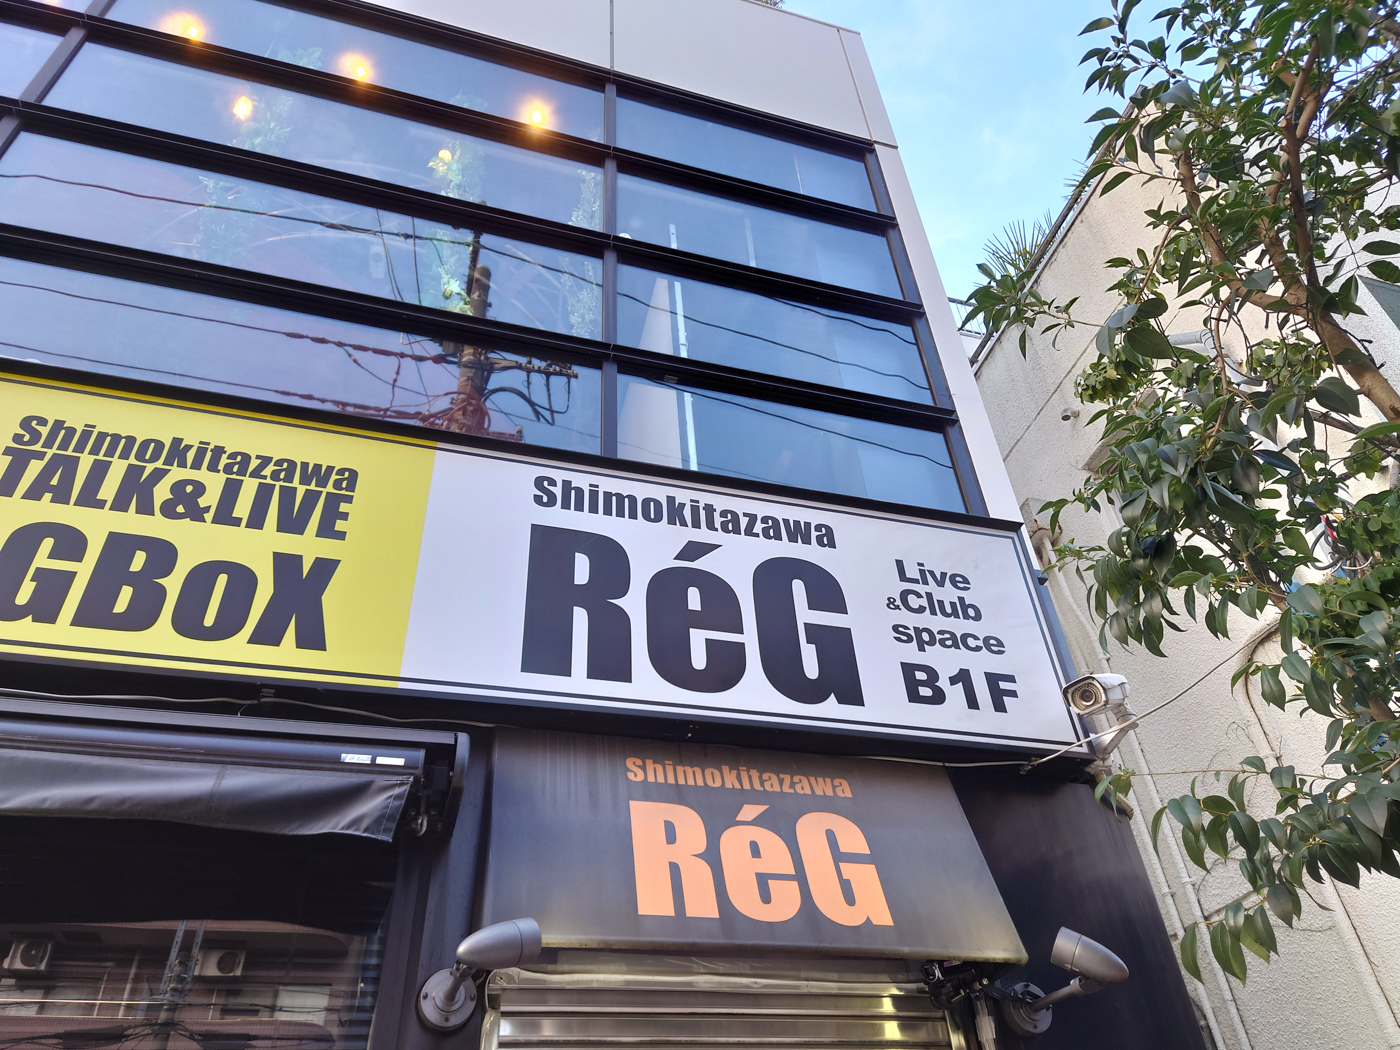 "AMAGAMI RECORD presents 『DOG MONSTER 2nd ALBUM""PIMPA""&てのひらえる初全国流通音源ダブルRelease party 東京編』supported by ファミメ!@下北沢ReG"